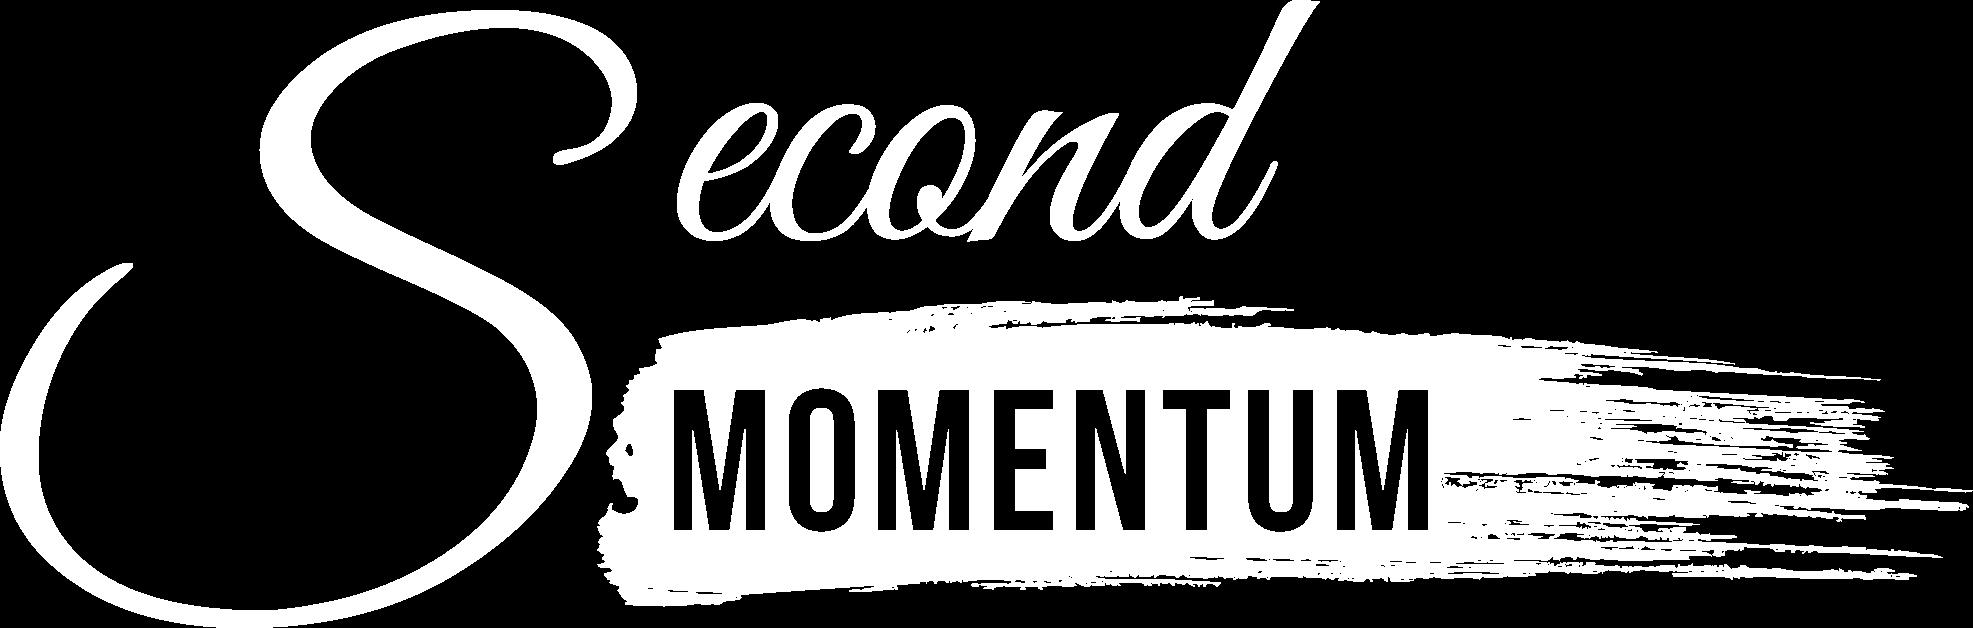 Second Momentum